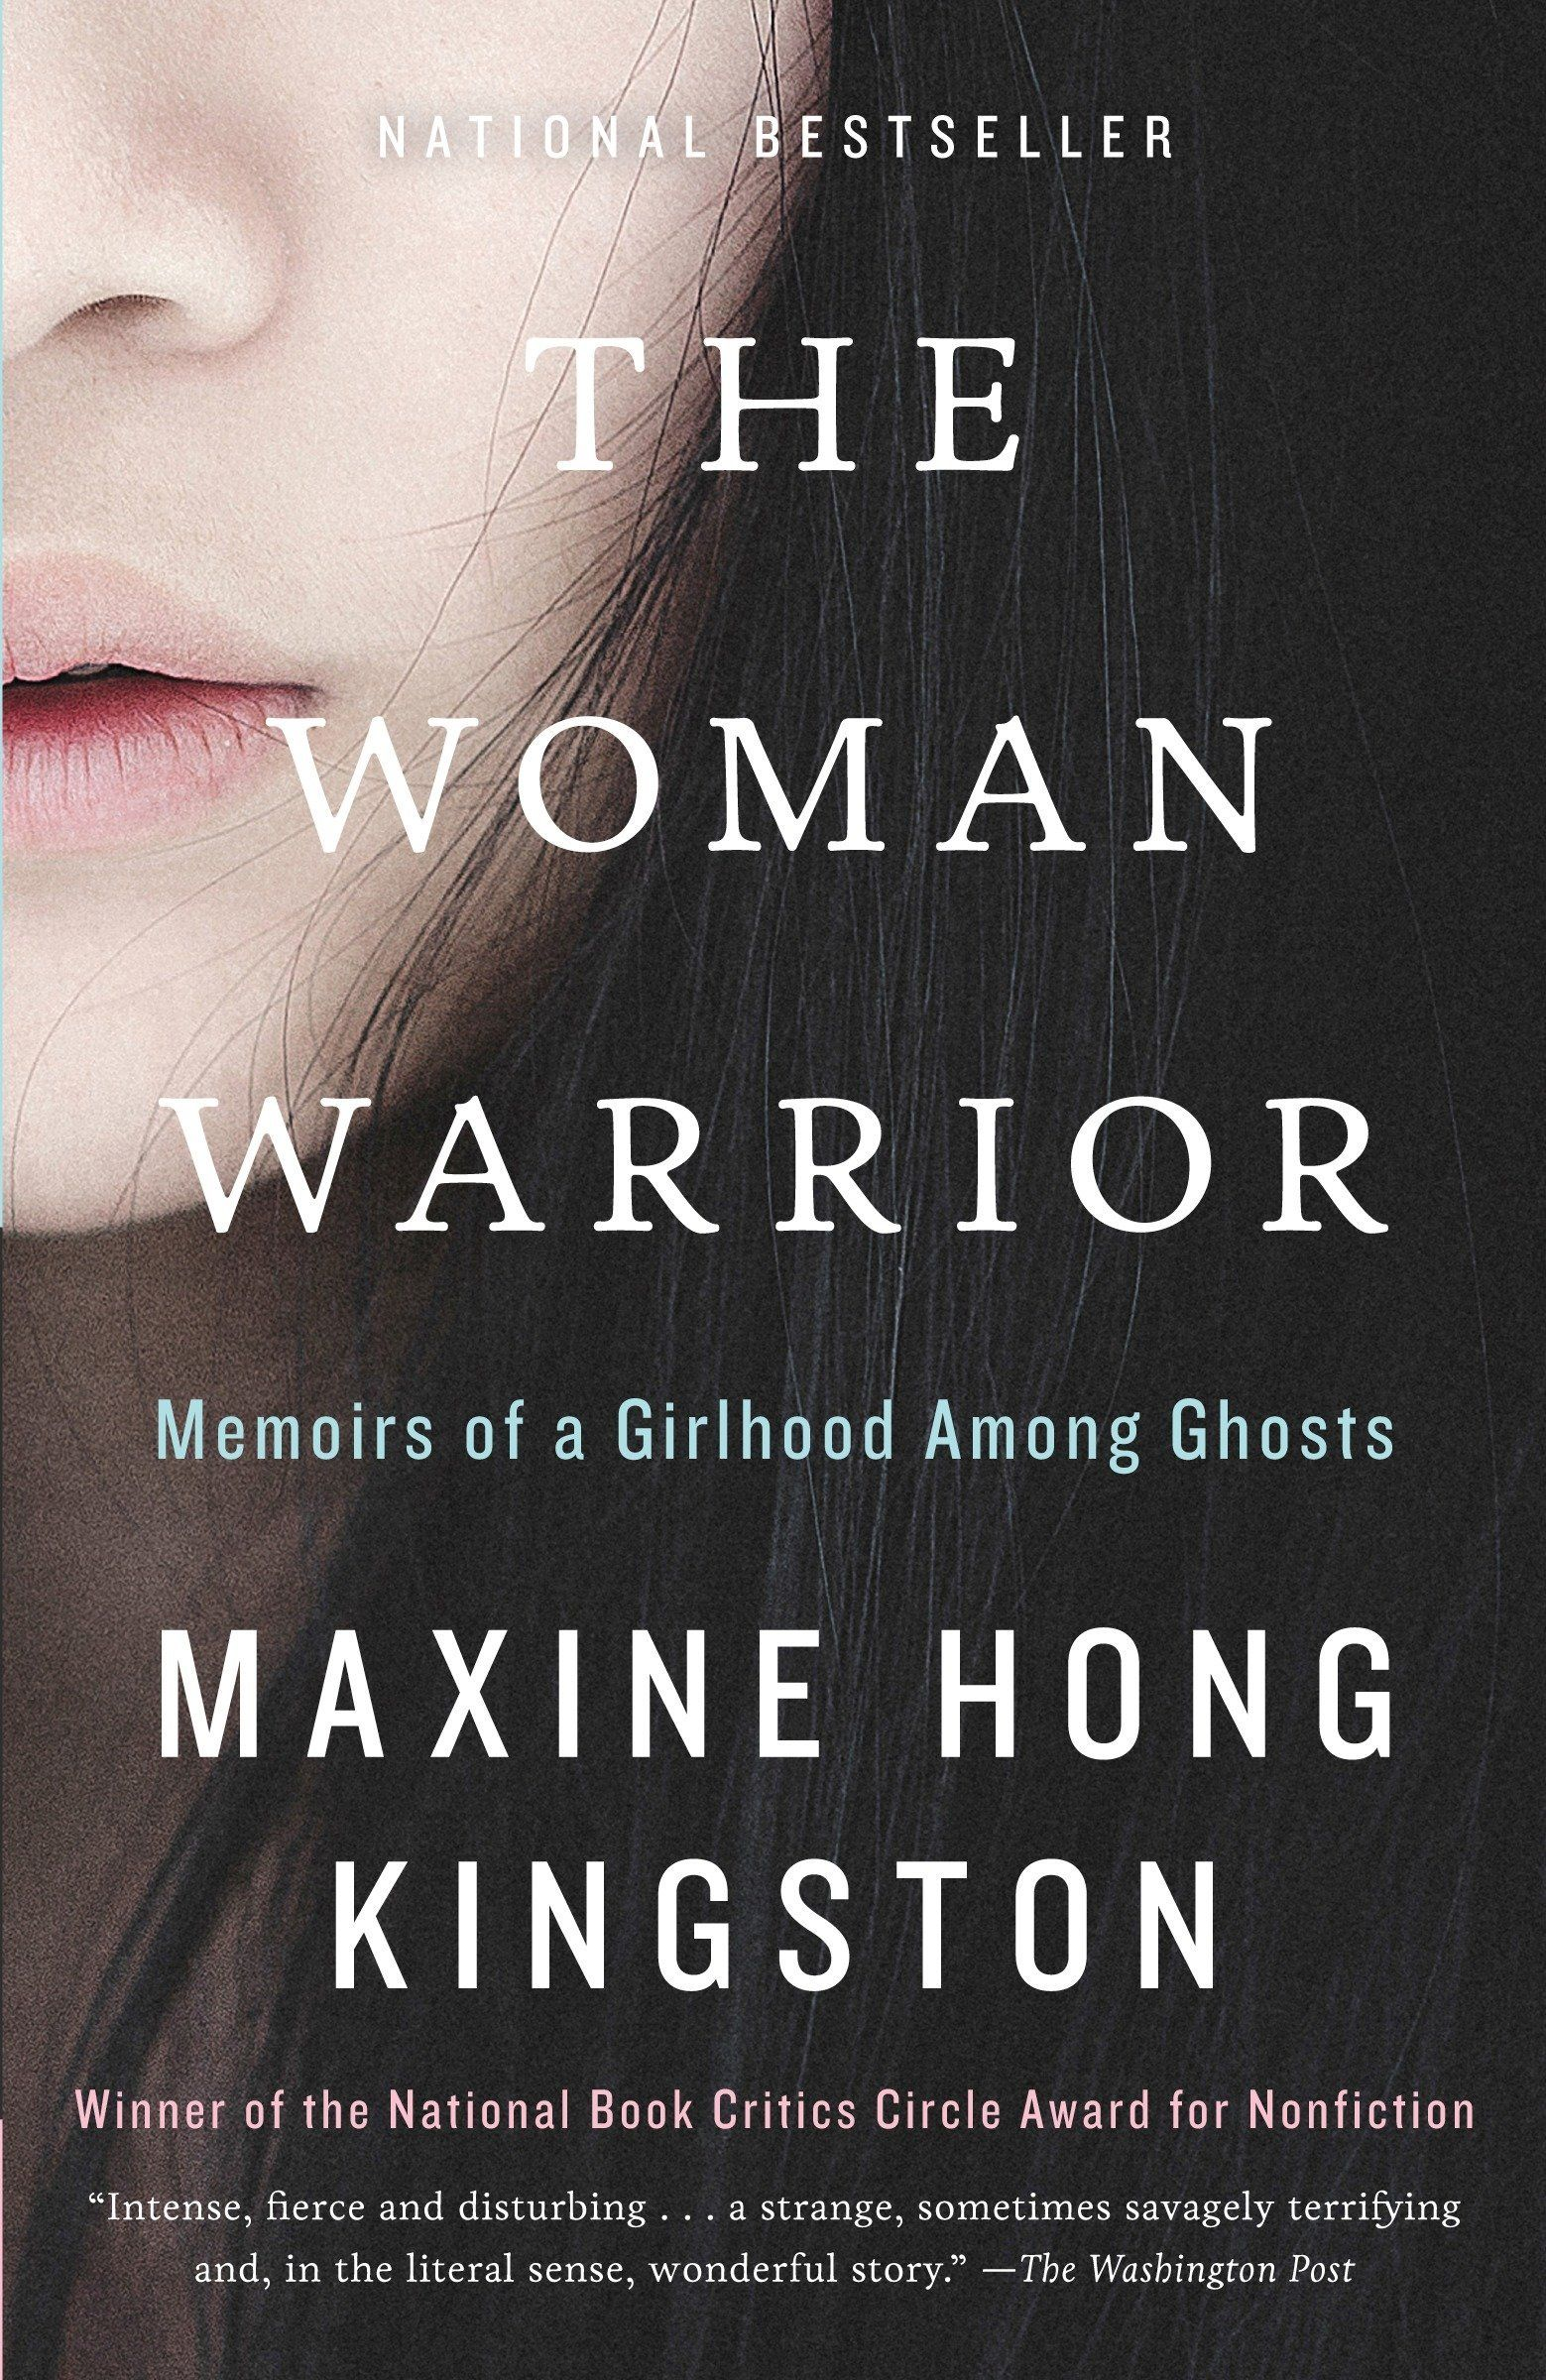 Maxine Hong Kingston The Woman Warrior Maxine Hong Kingston Warrior Woman Feminist Books